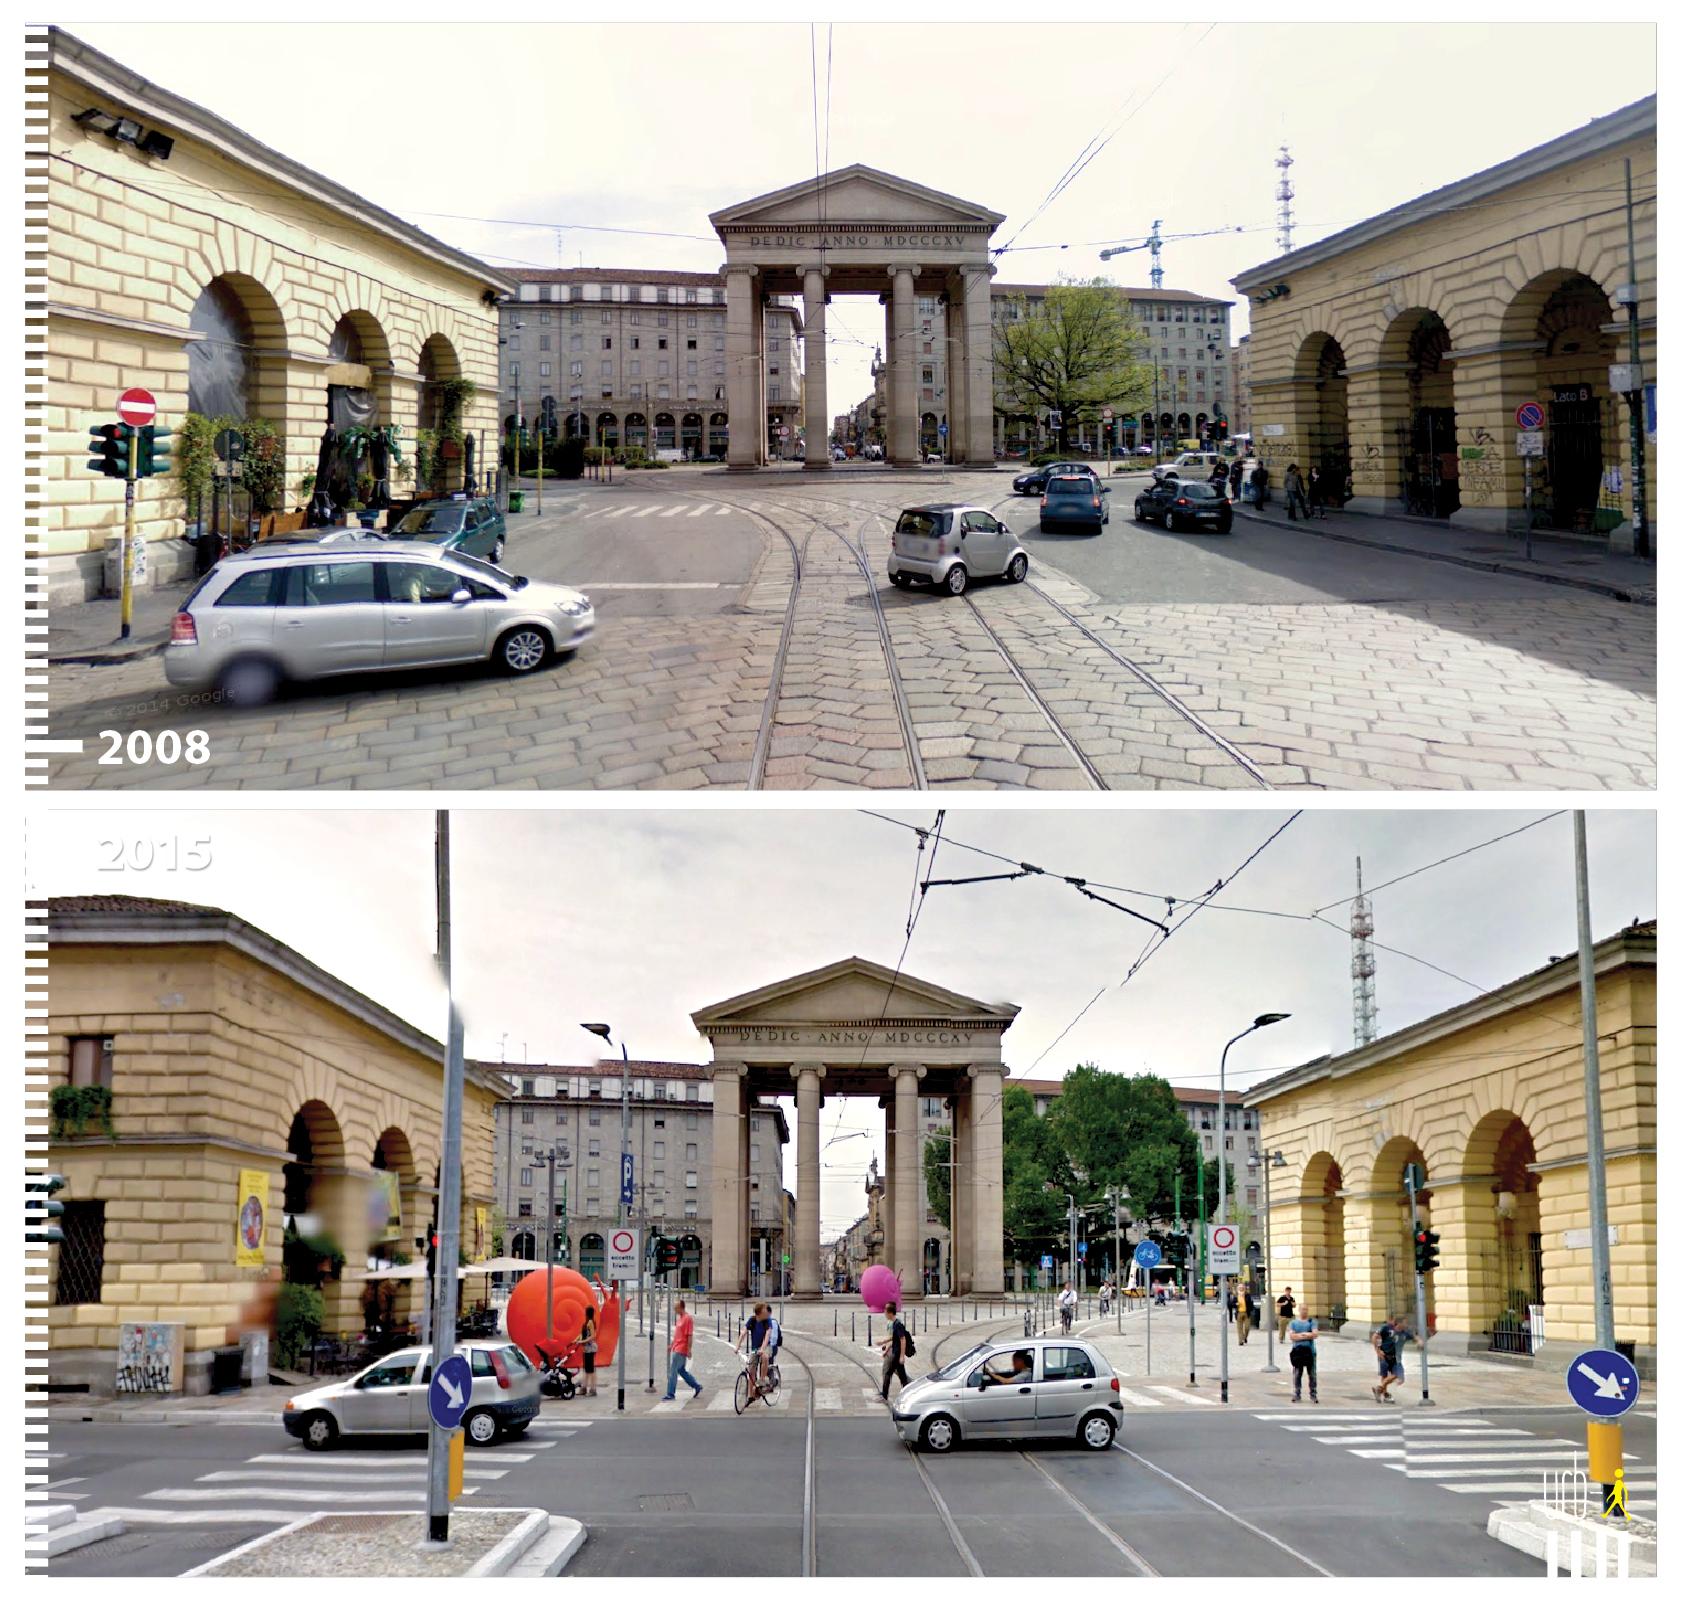 0967  IT Milan, Piazza XXIV Maggio